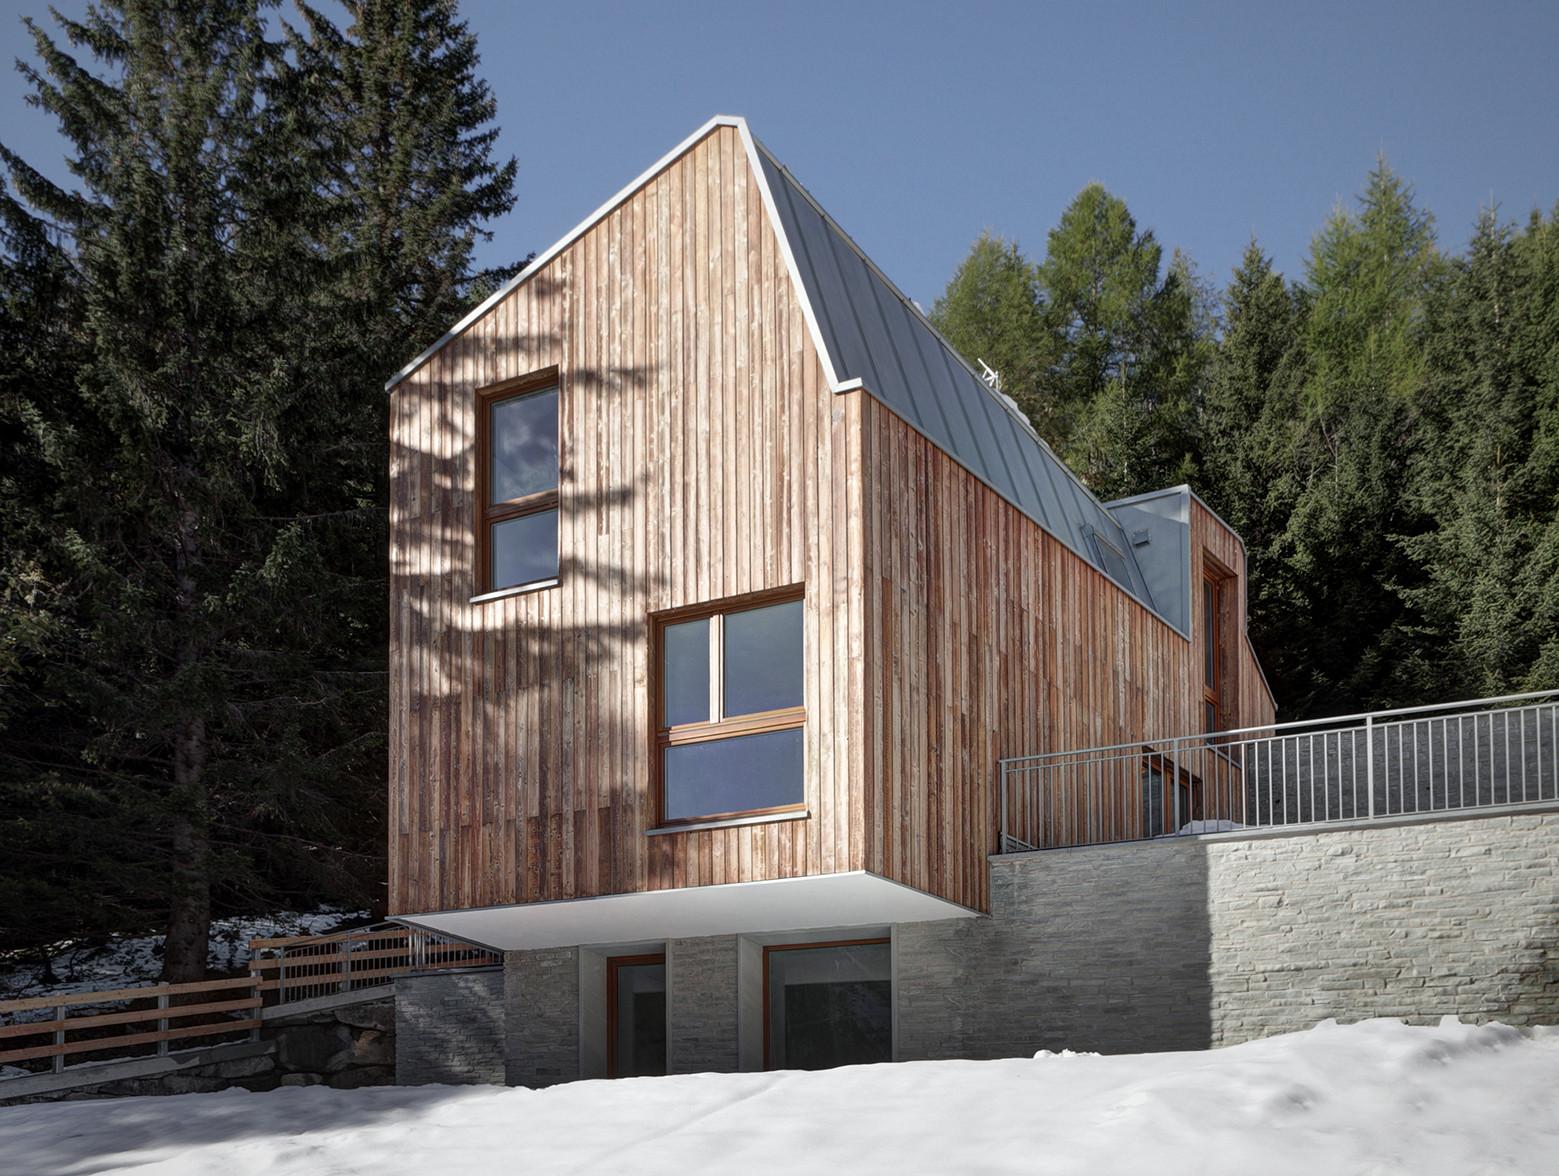 casa fm consalez rossi architetti associati